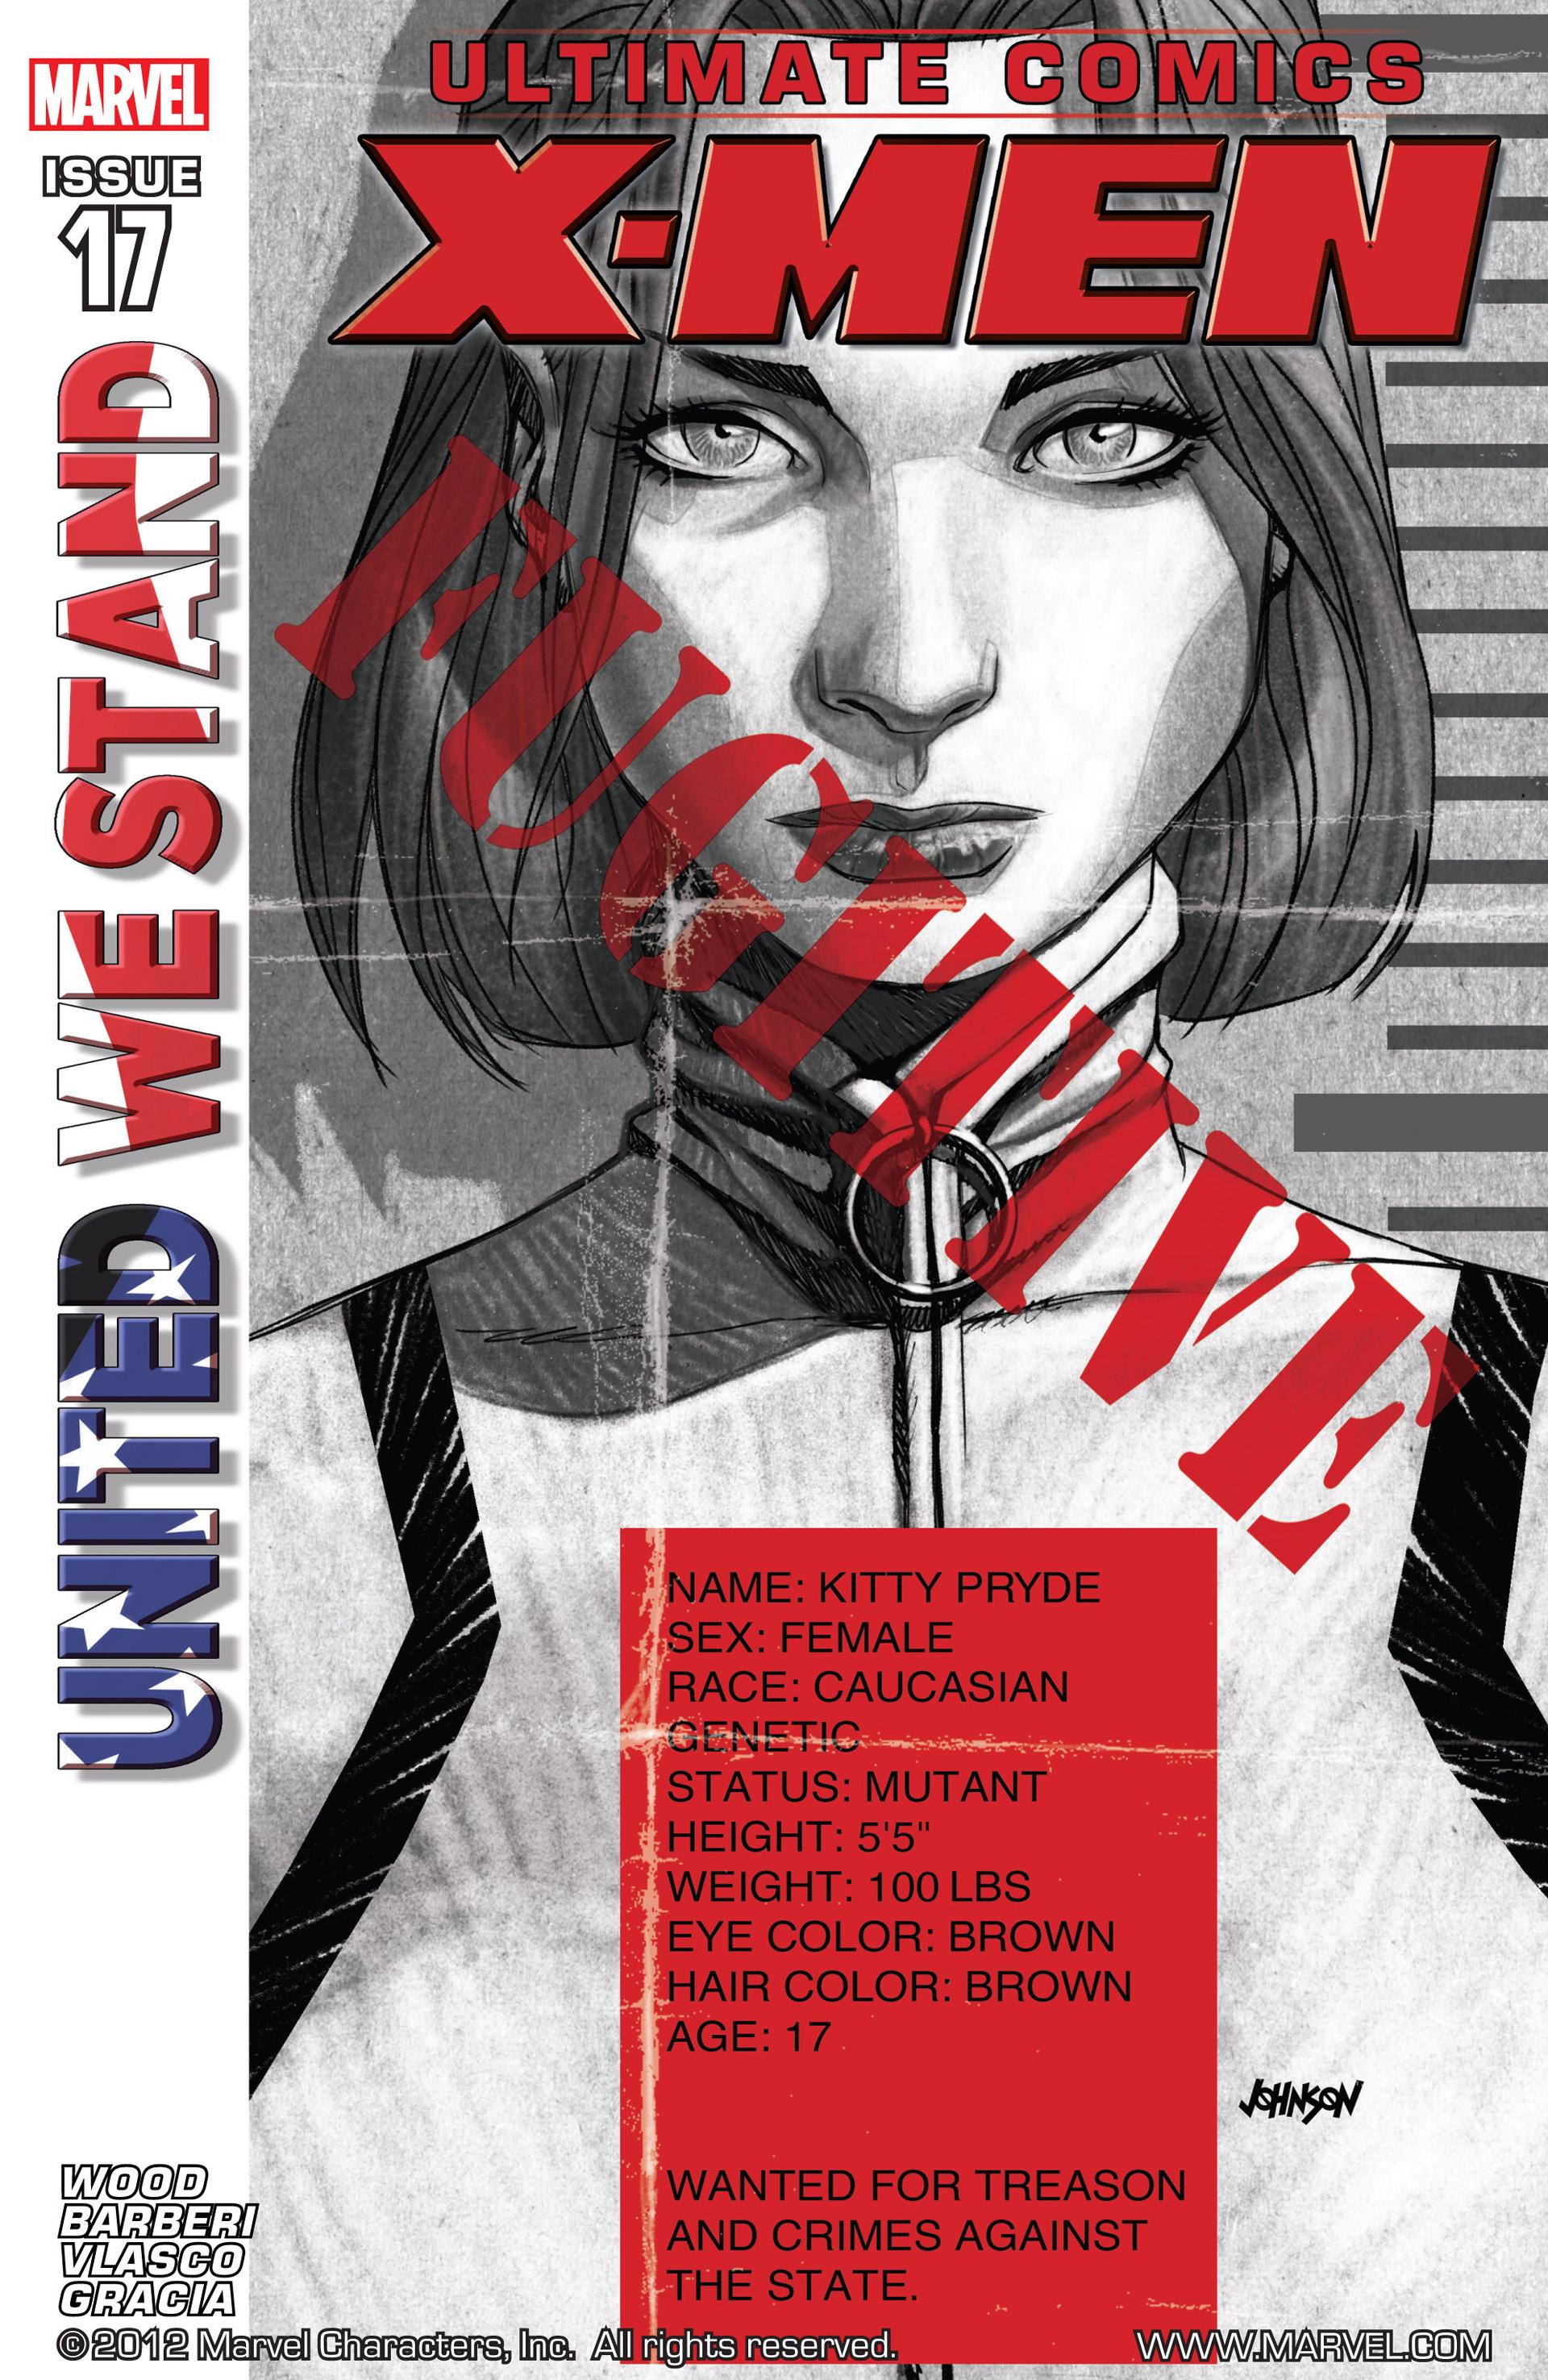 Read online Ultimate Comics X-Men comic -  Issue #17 - 1